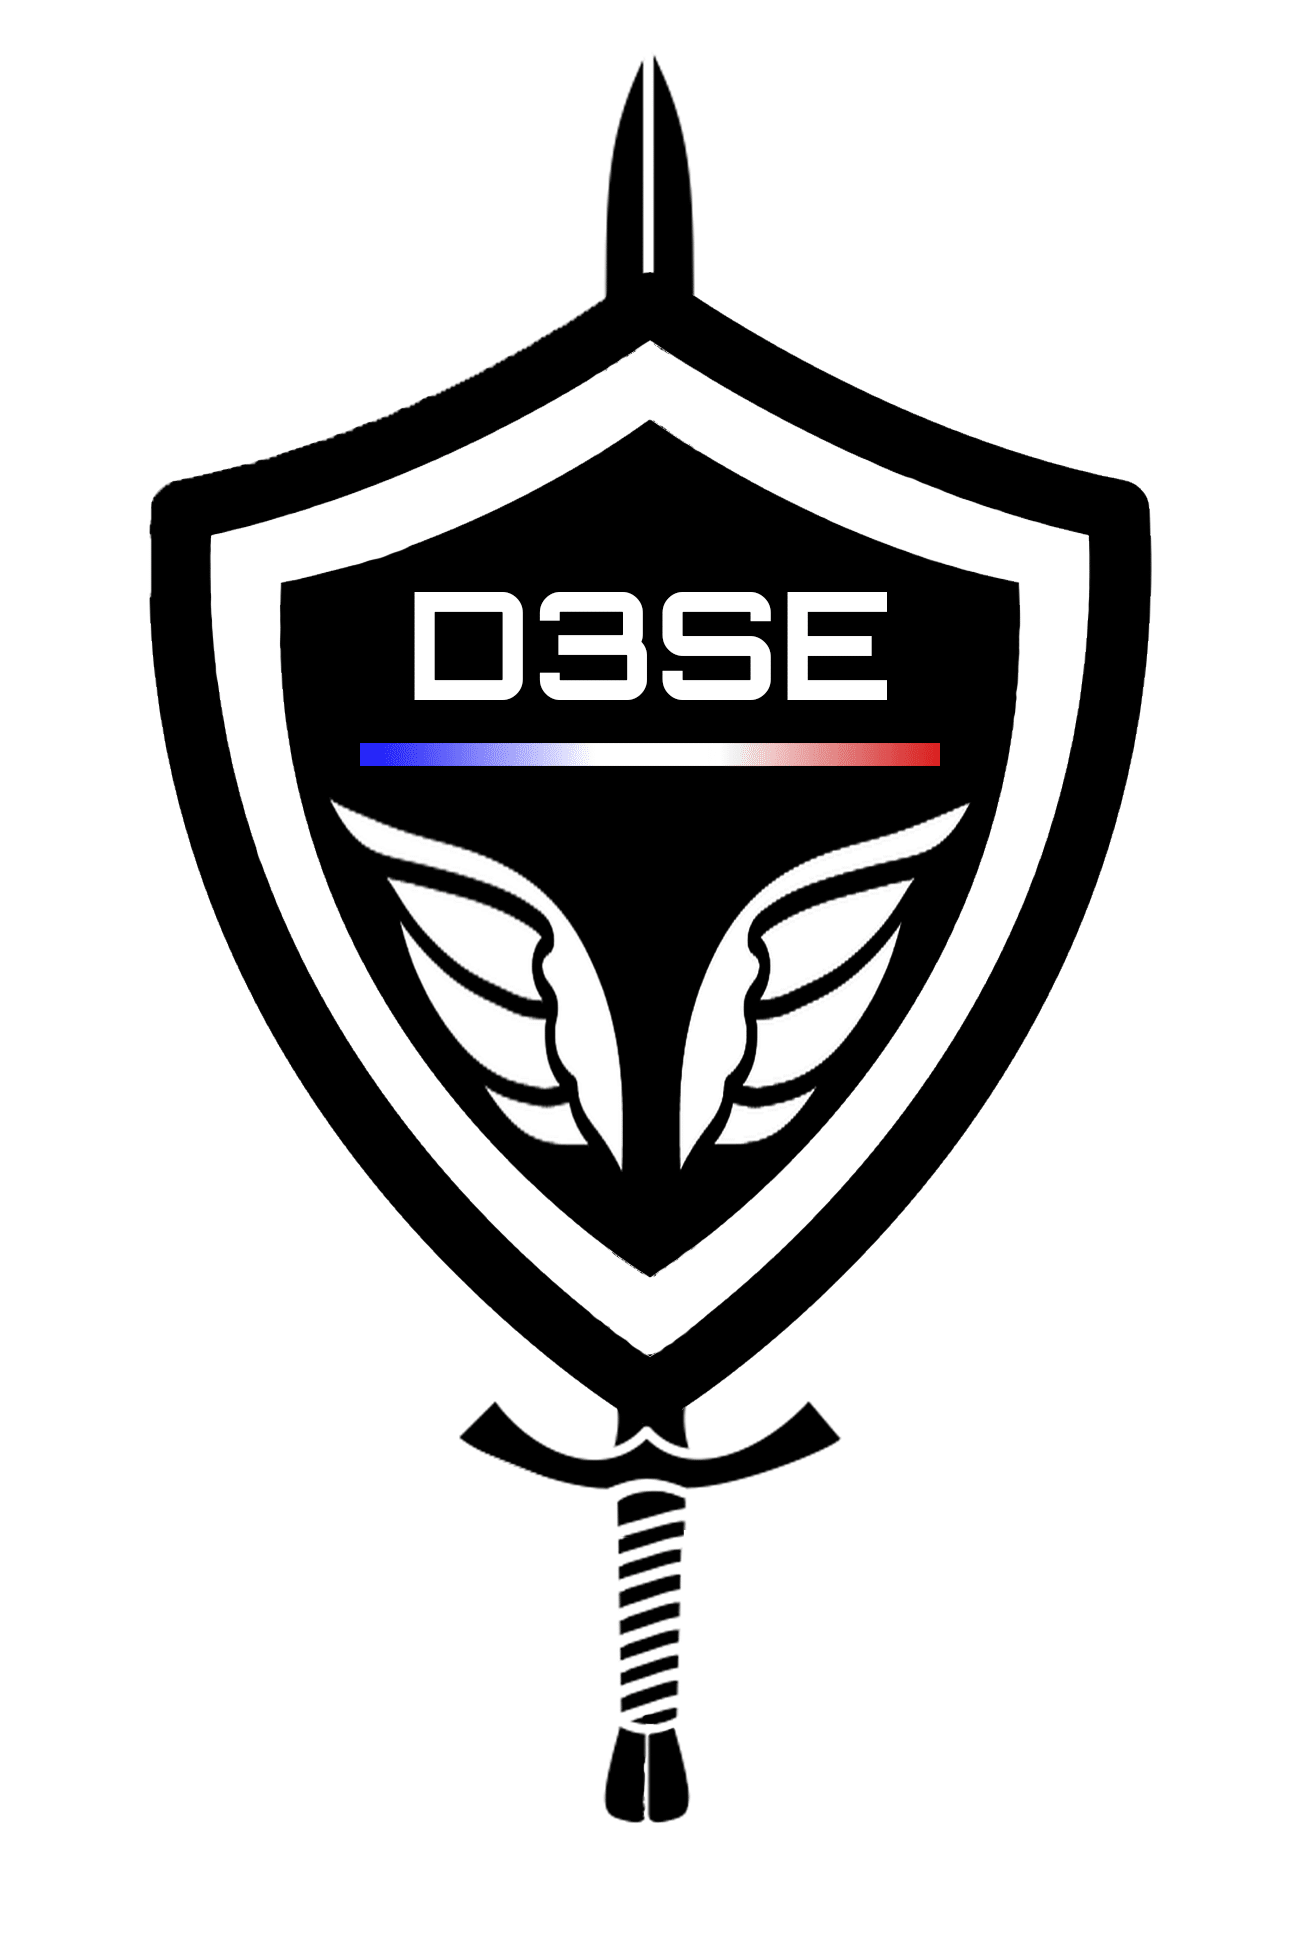 D3SE_logo